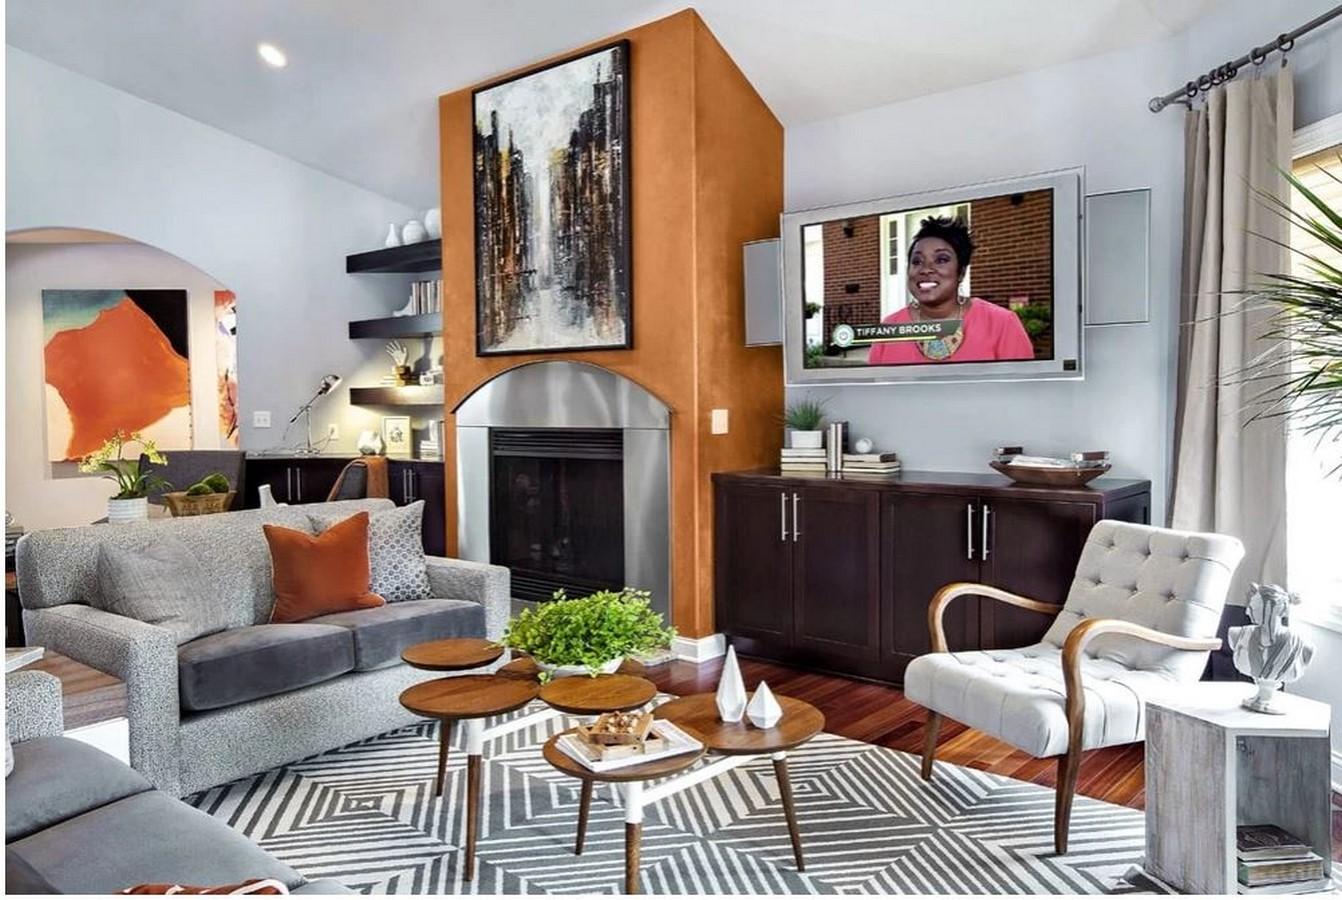 Tiffany Brooks Interiors- 15 Iconic Projects - Sheet7